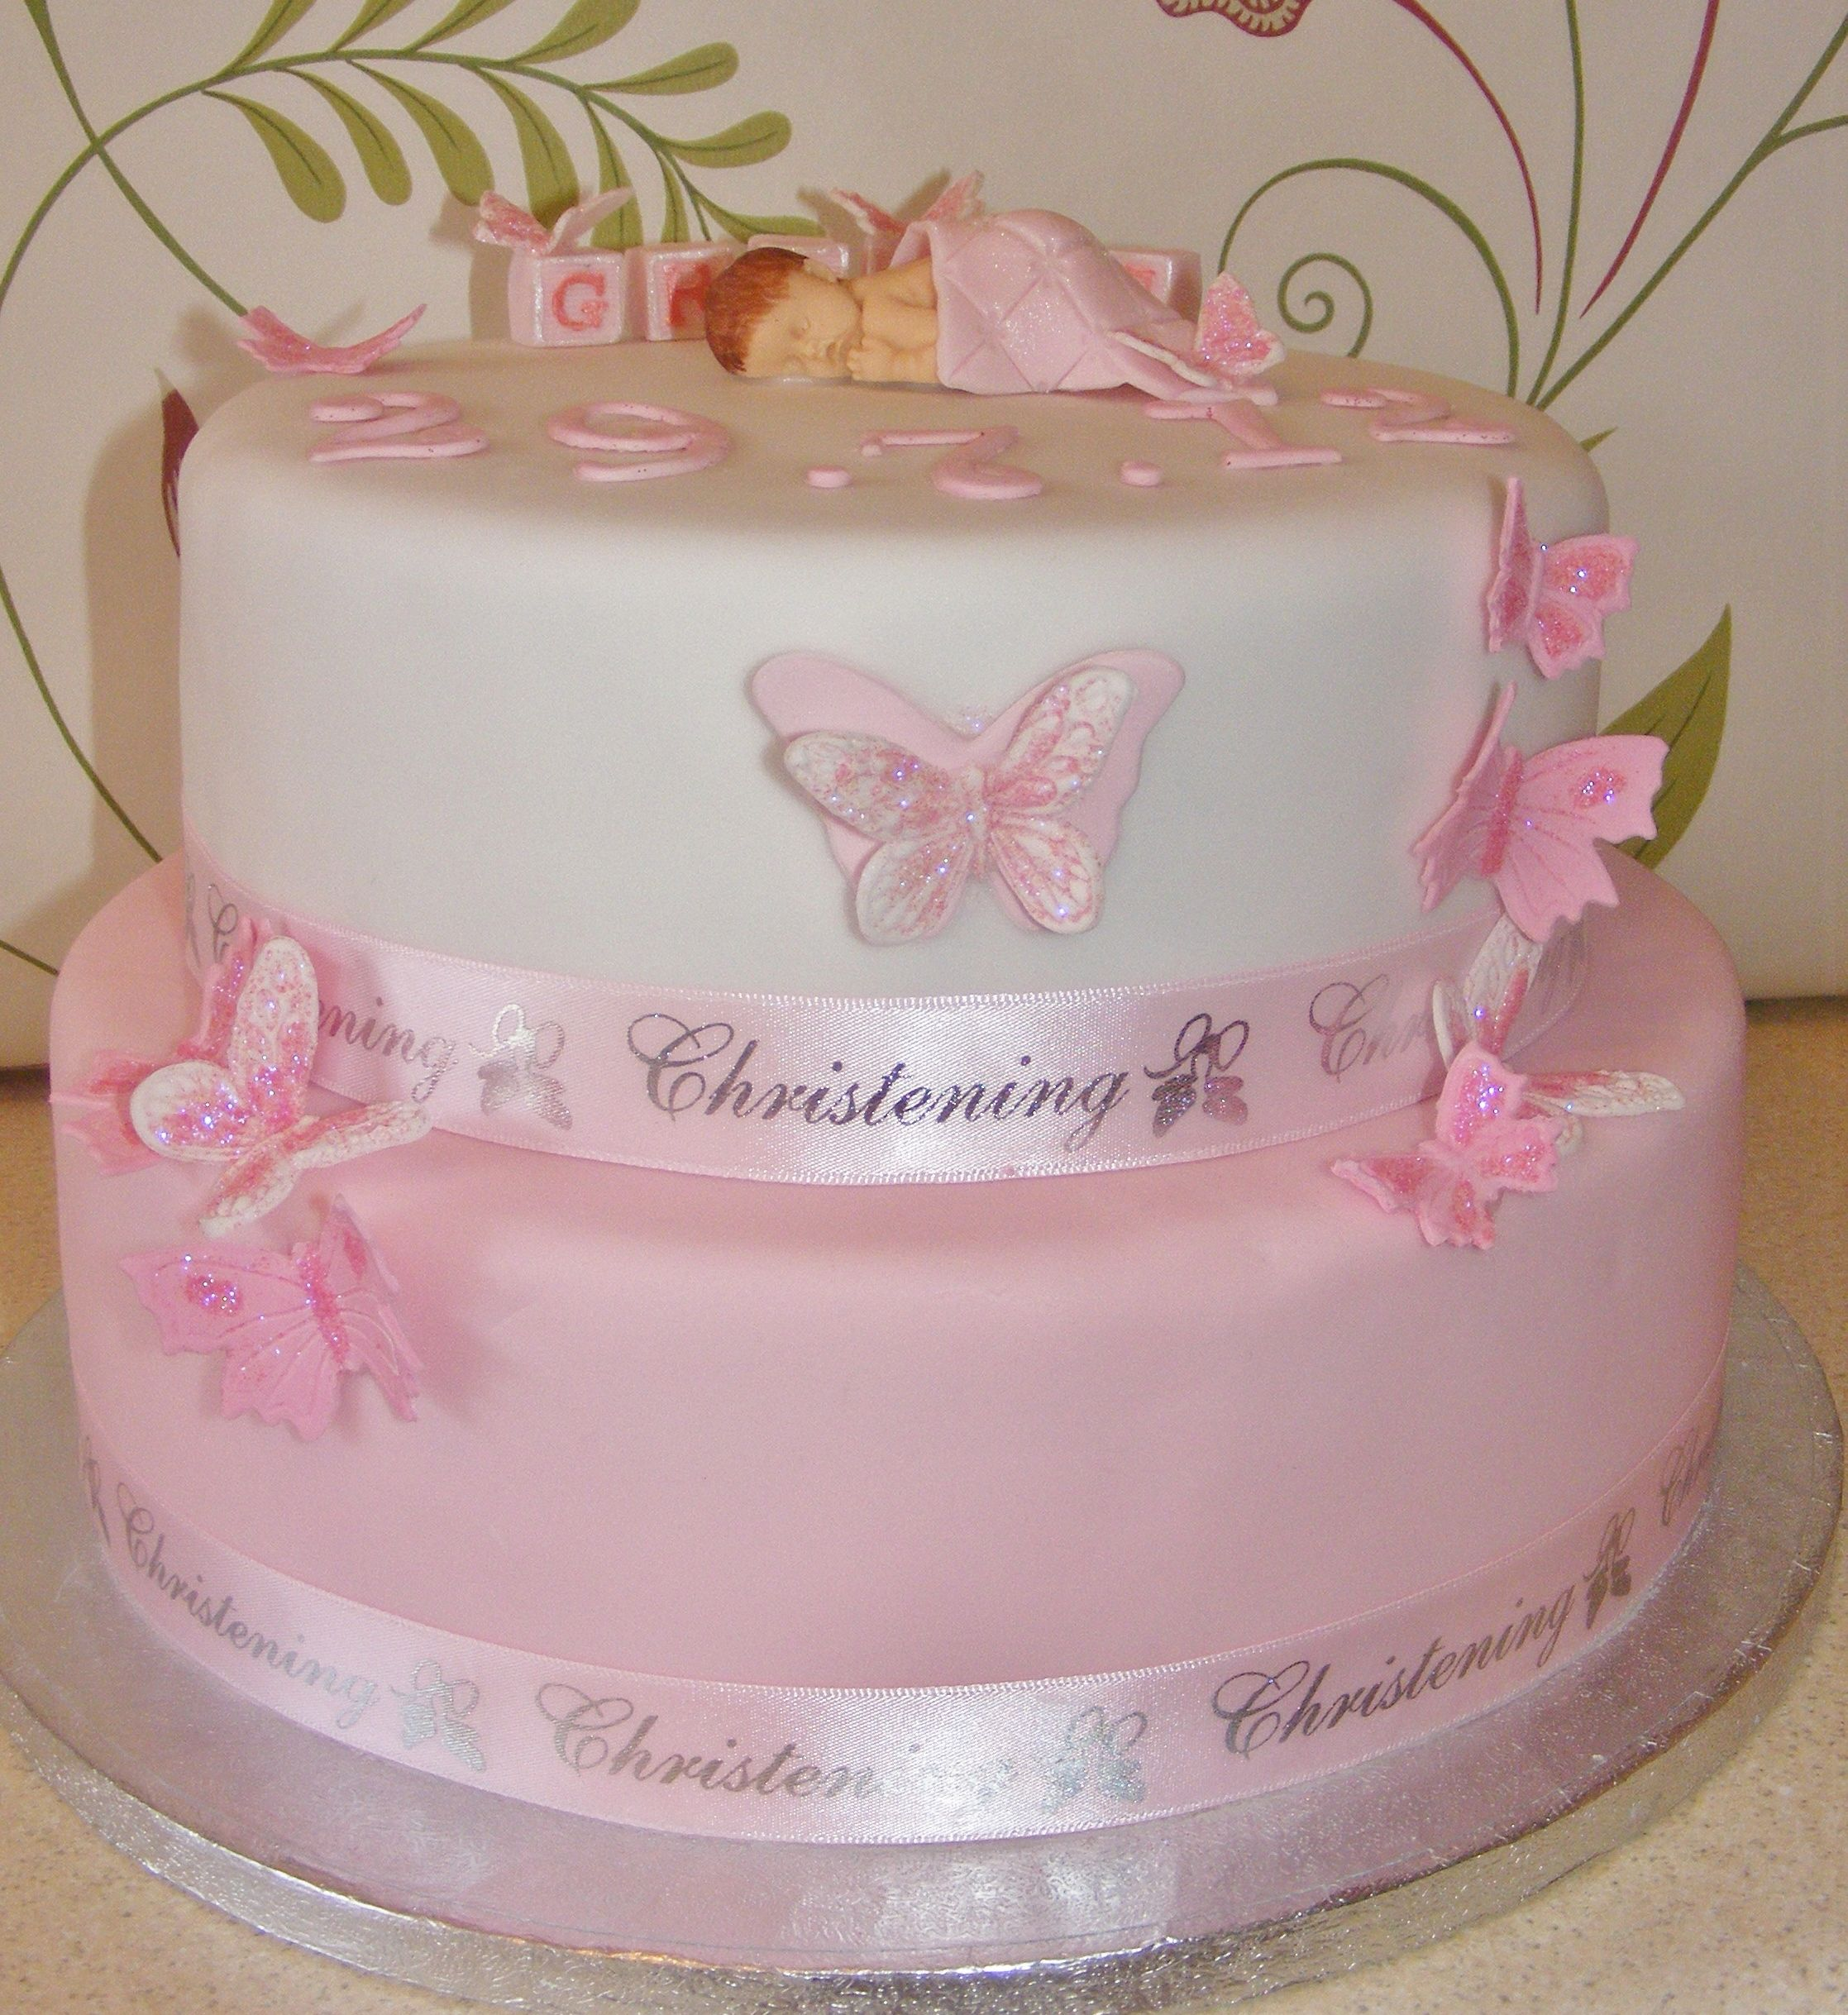 Gracie's Christening Cake